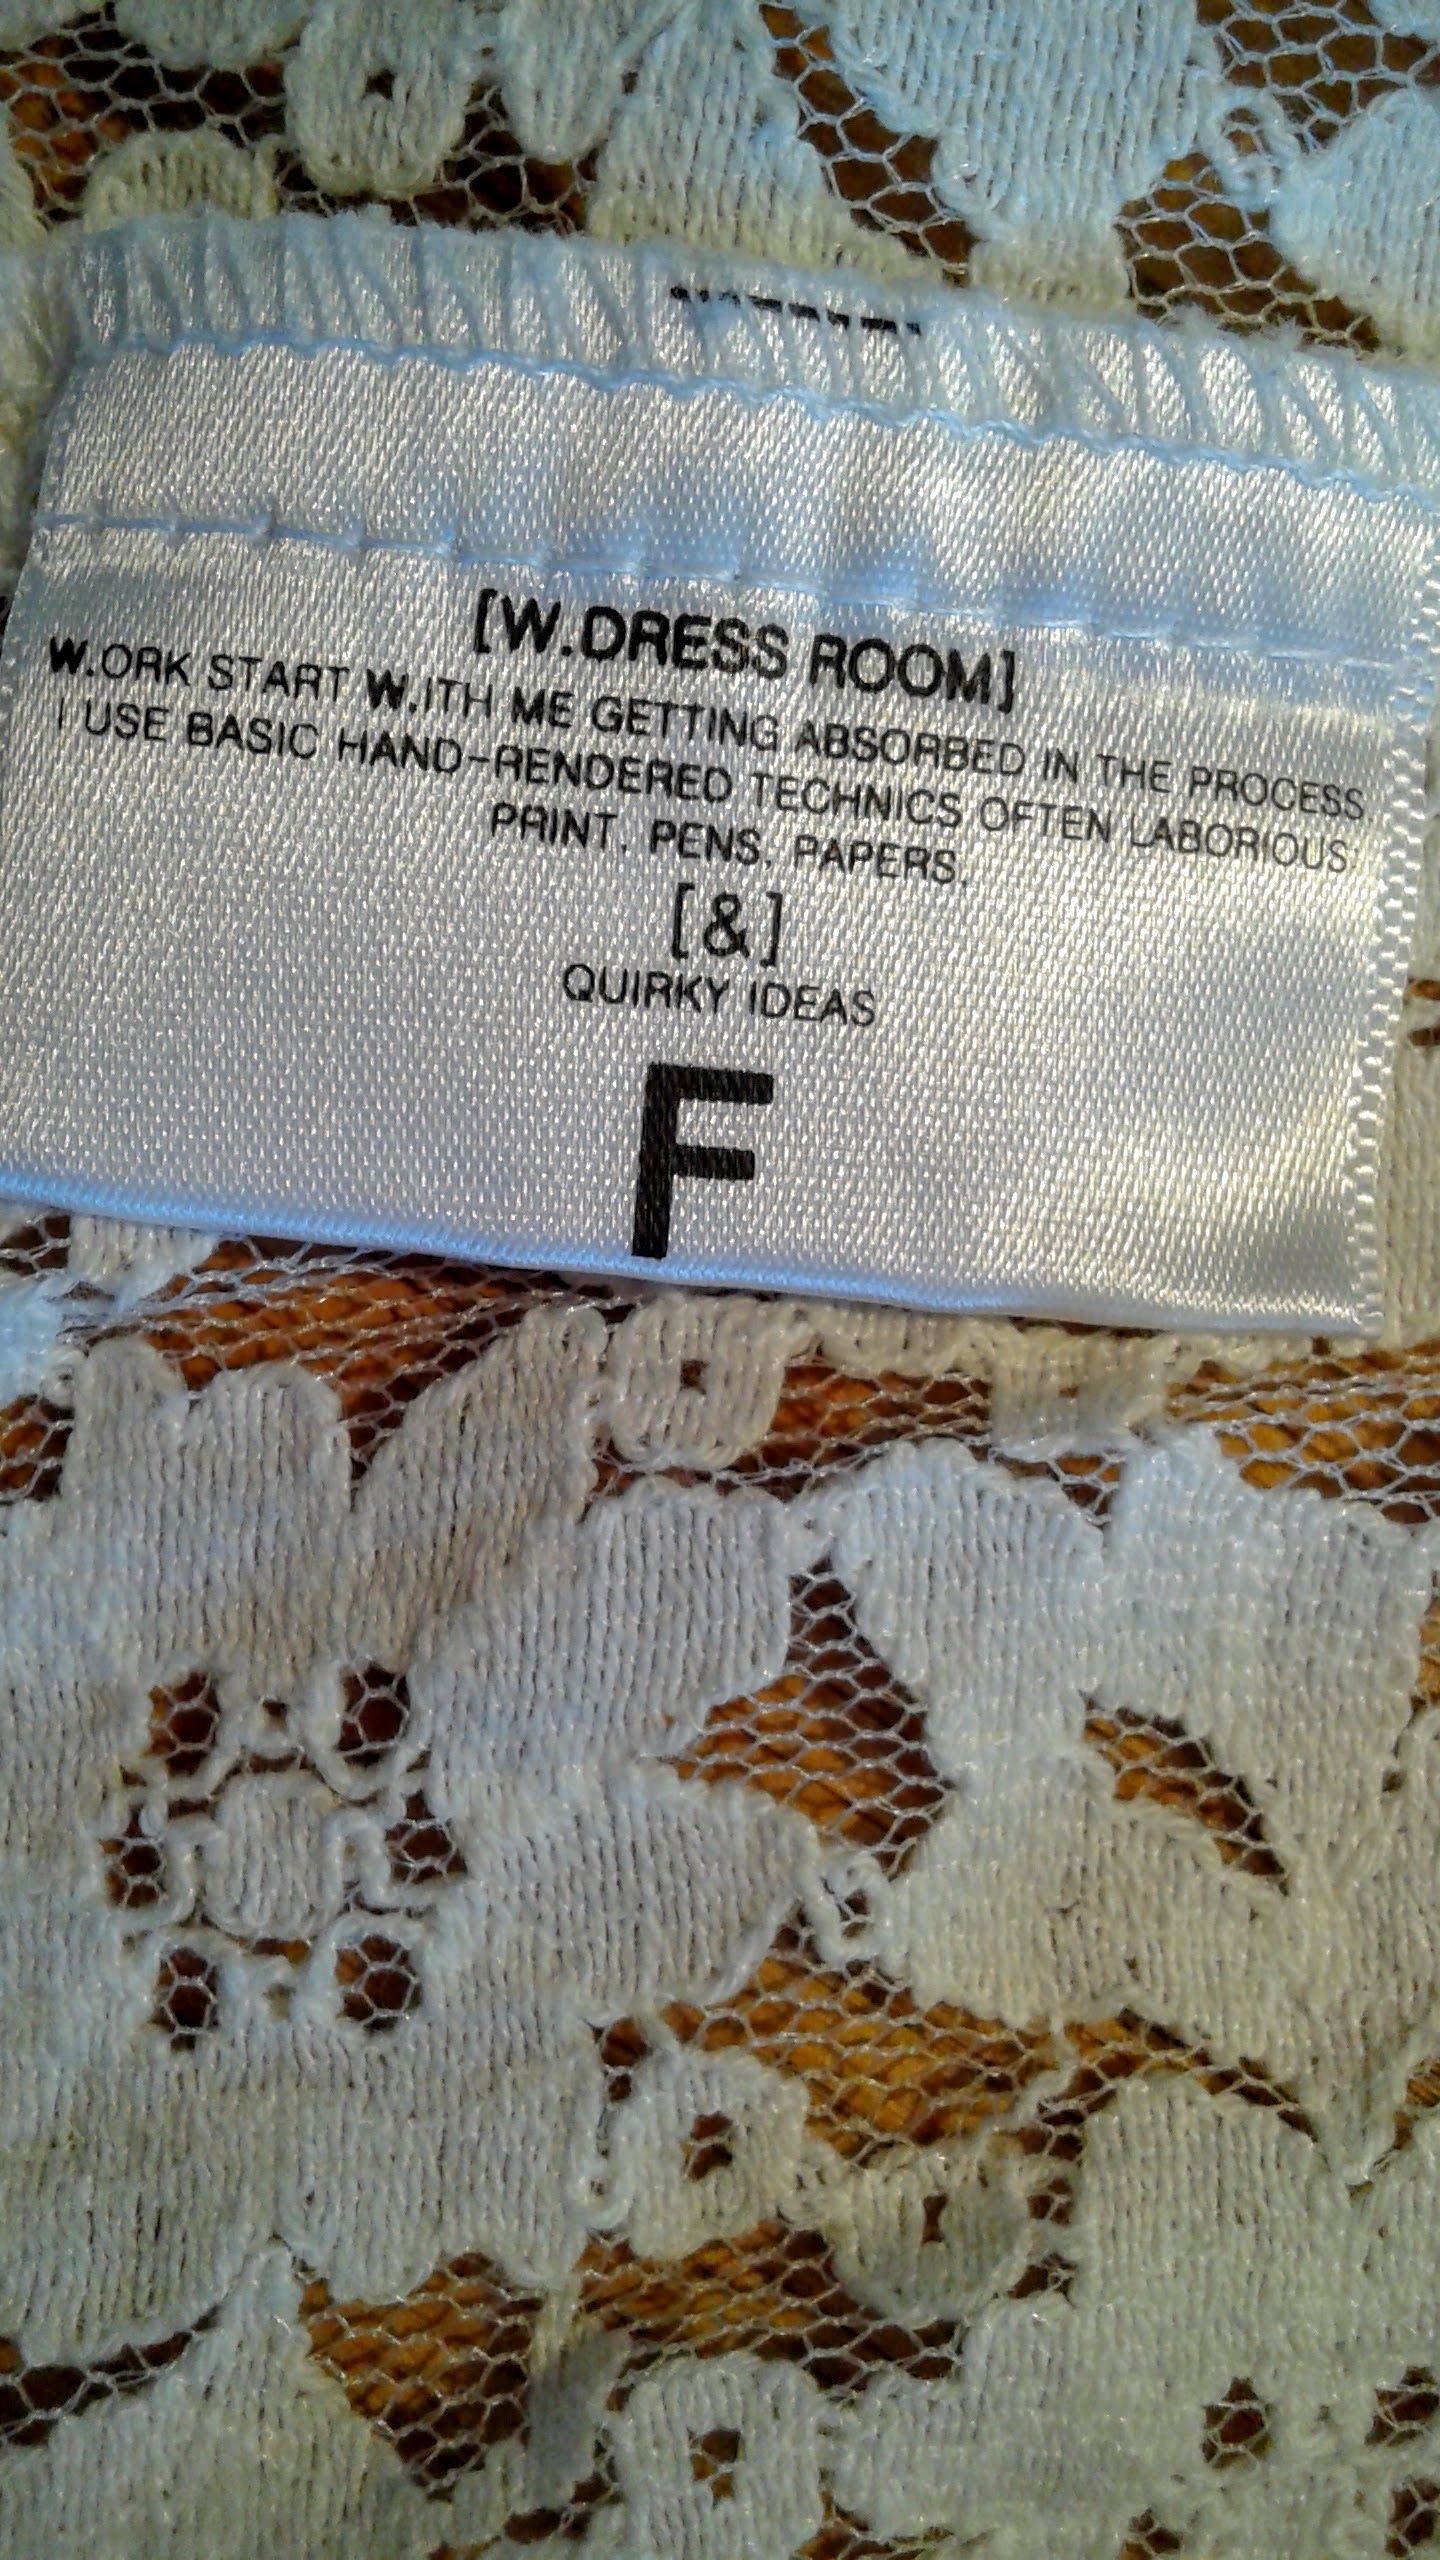 W. Dress Room